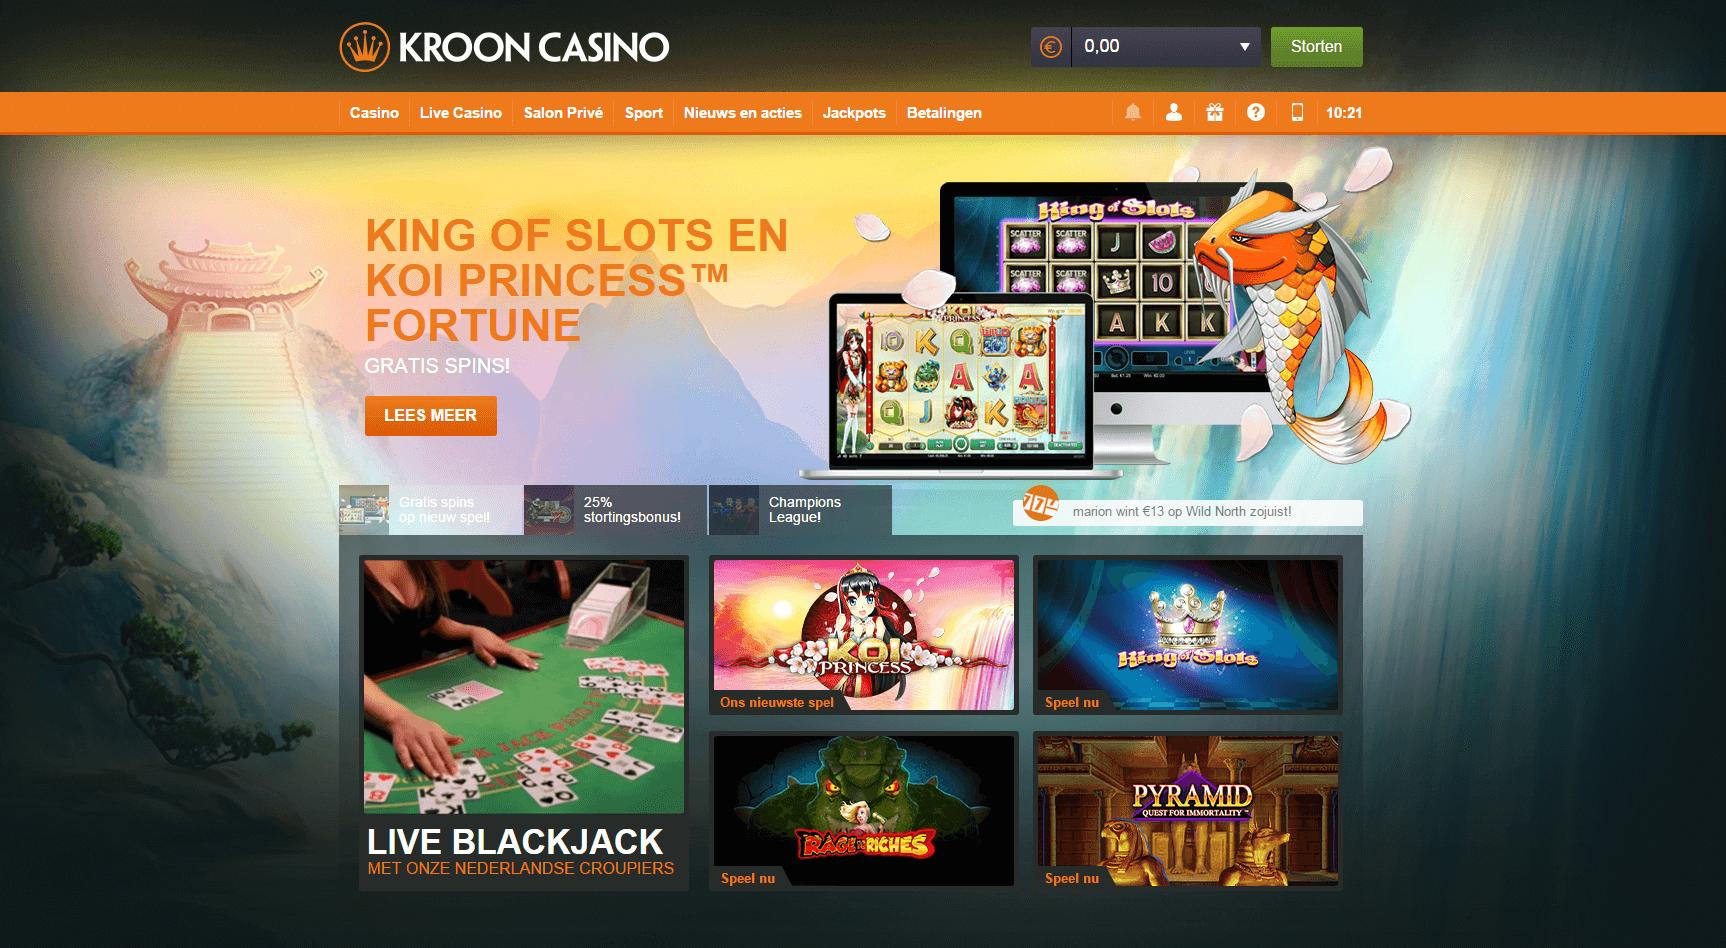 Kroon review Welkomstpagina